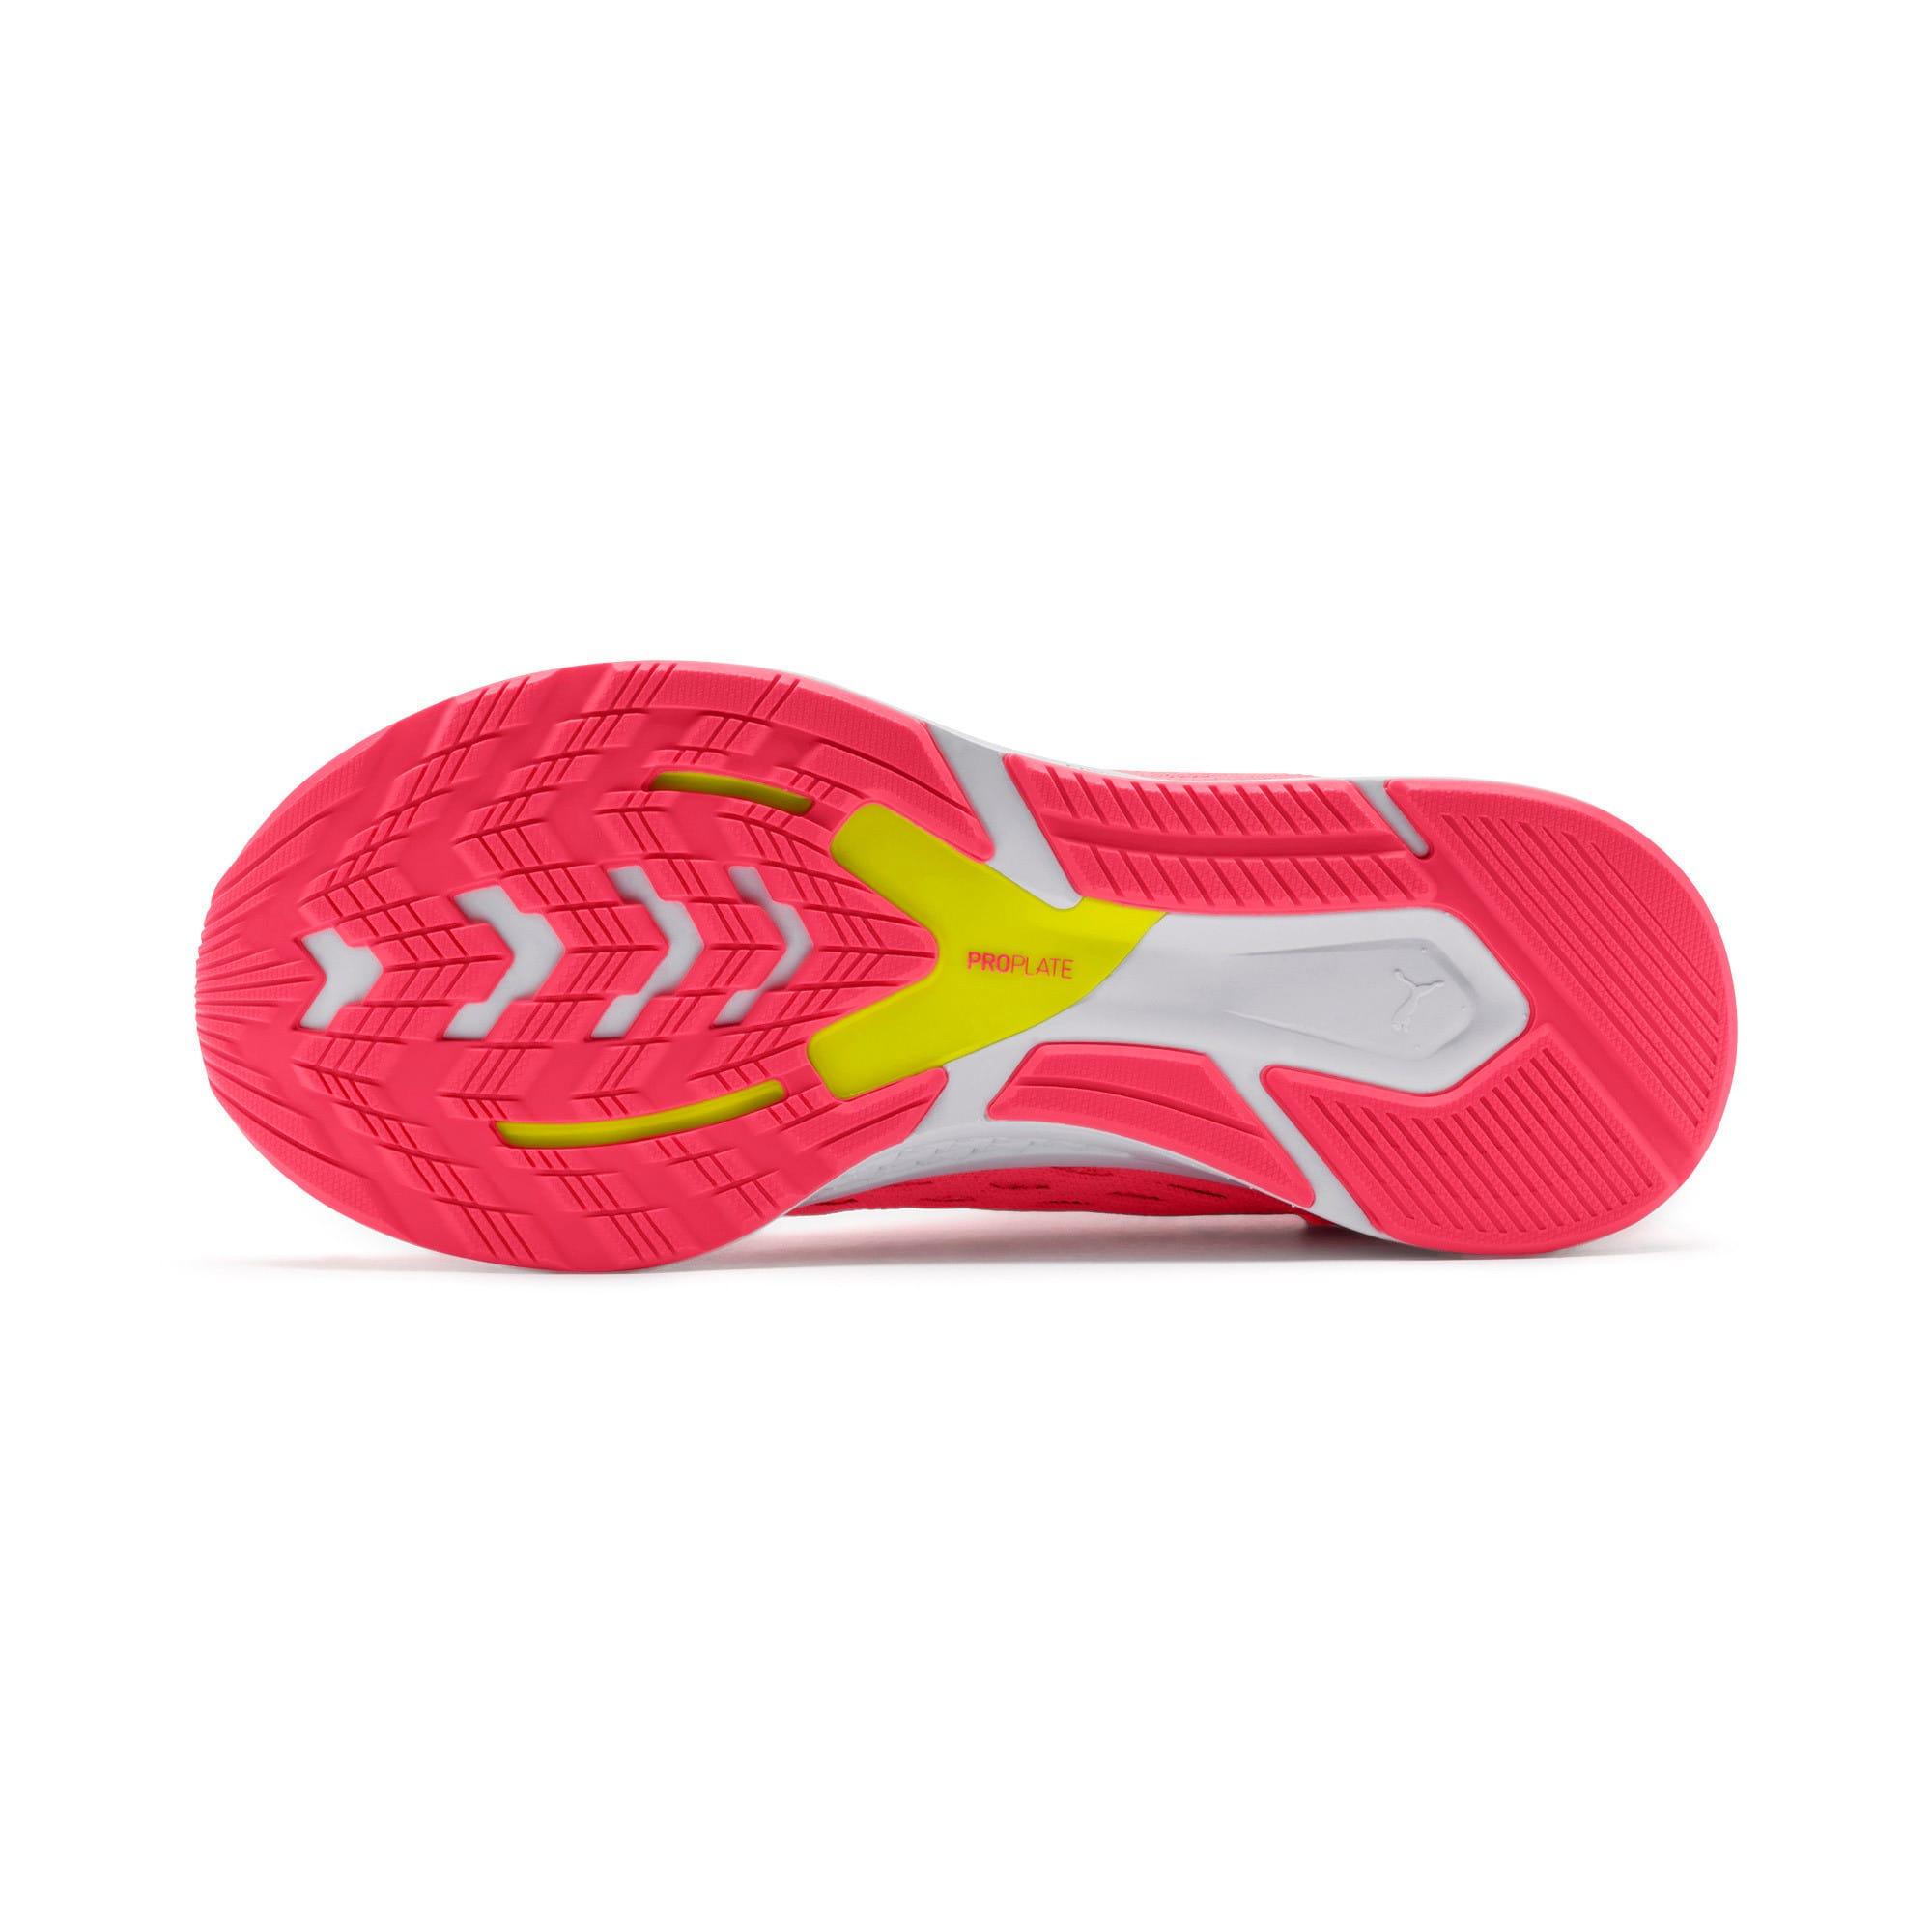 Miniatura 4 de Zapatos para correrSPEED500 para mujer, Pink Alert-White-Yellow, mediano